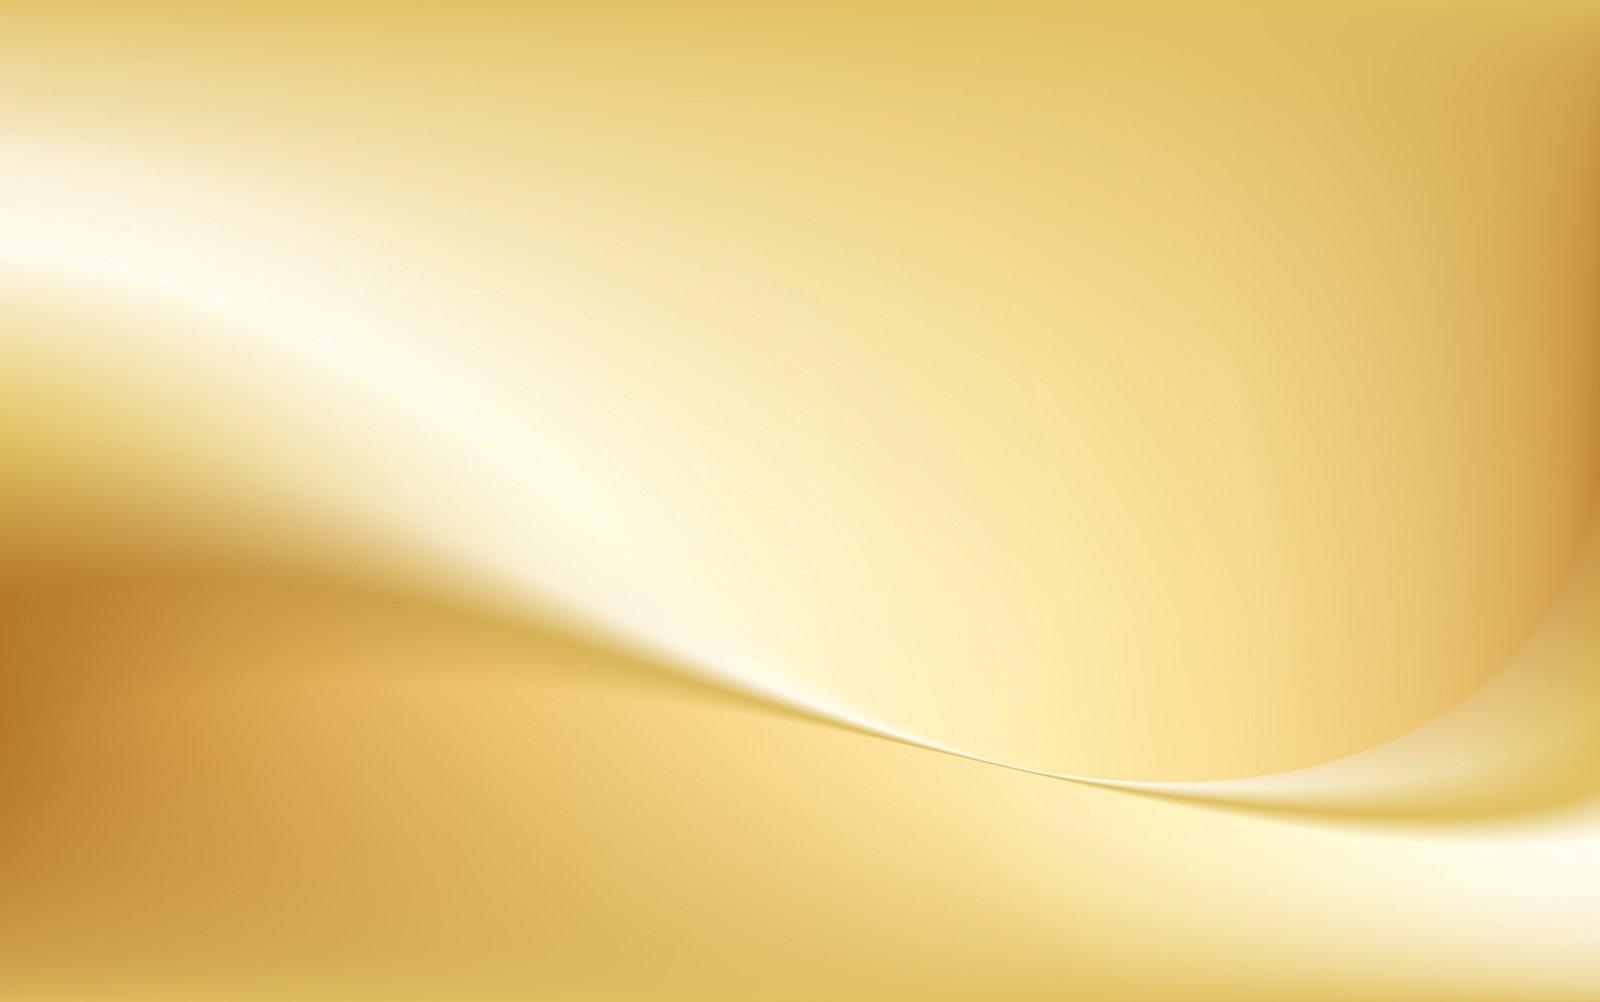 Gold And Pink Metallic Wallpaper Wallpapersafari